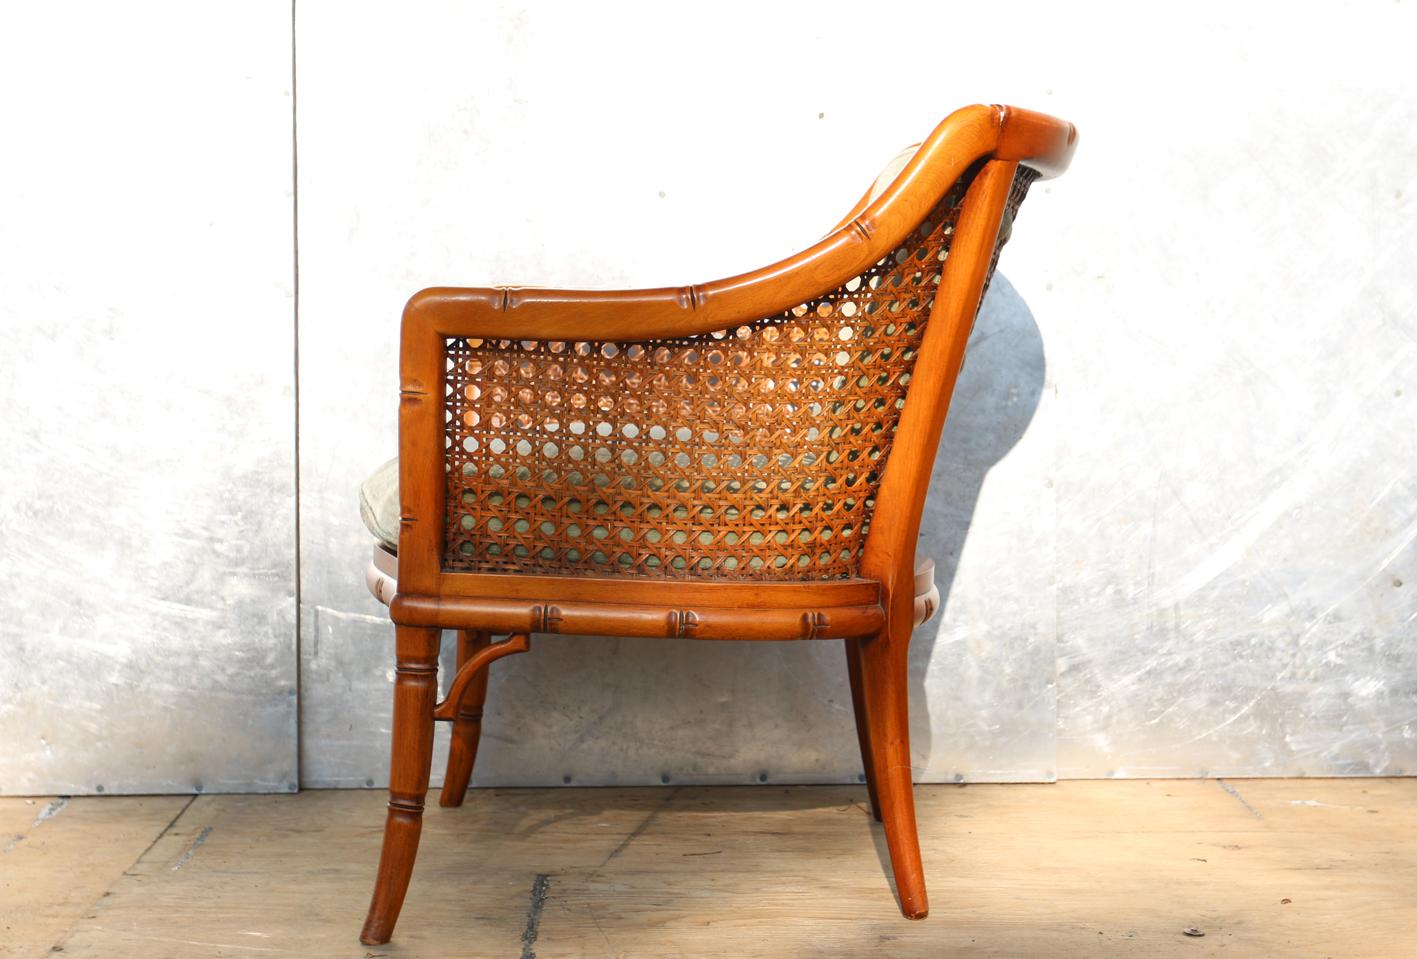 Retro vintage giorgetti fauteuil exotische vormen dehuiszwaluw - Mooie fauteuil ...